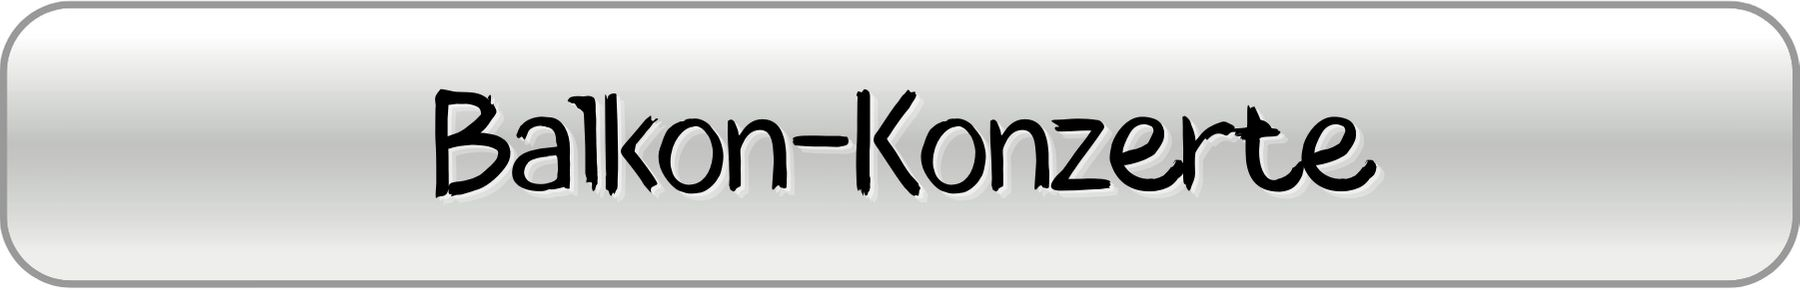 Balkon-Konzerte zur Coronazeit